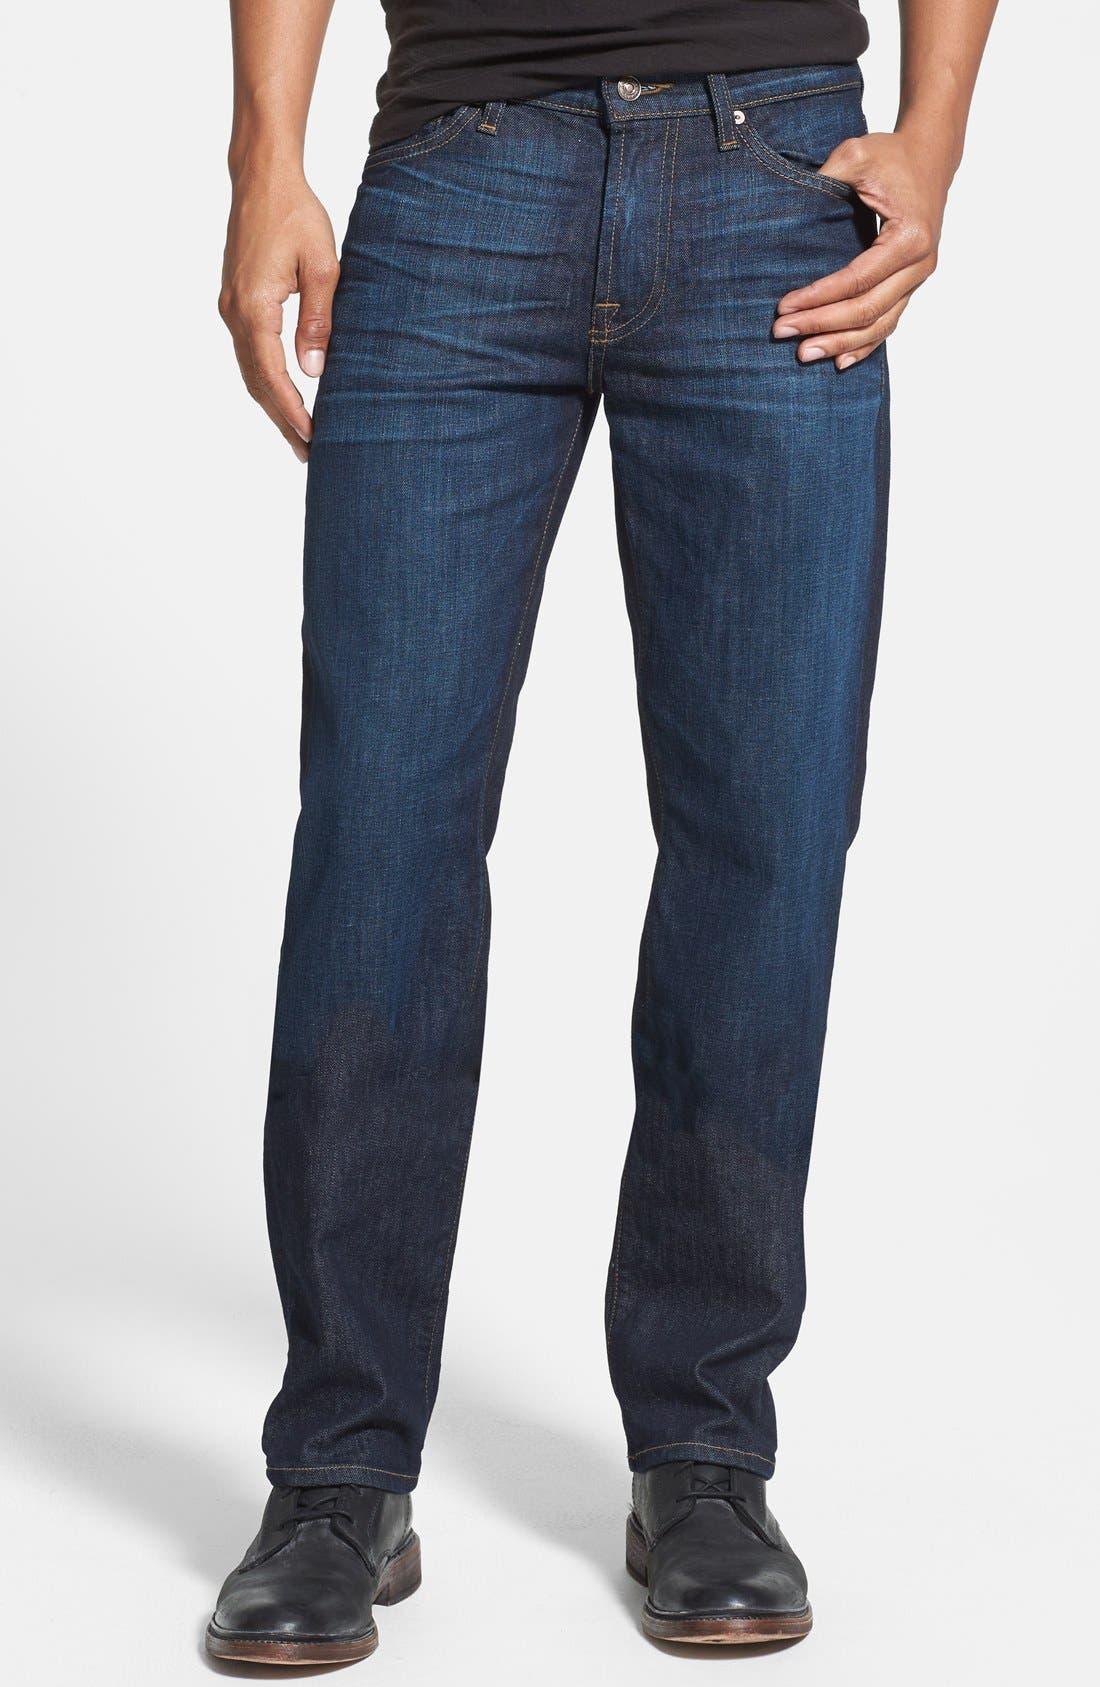 Main Image - 7 For All Mankind® 'Slimmy' Slim Straight Leg Jeans (Monaco Blue)